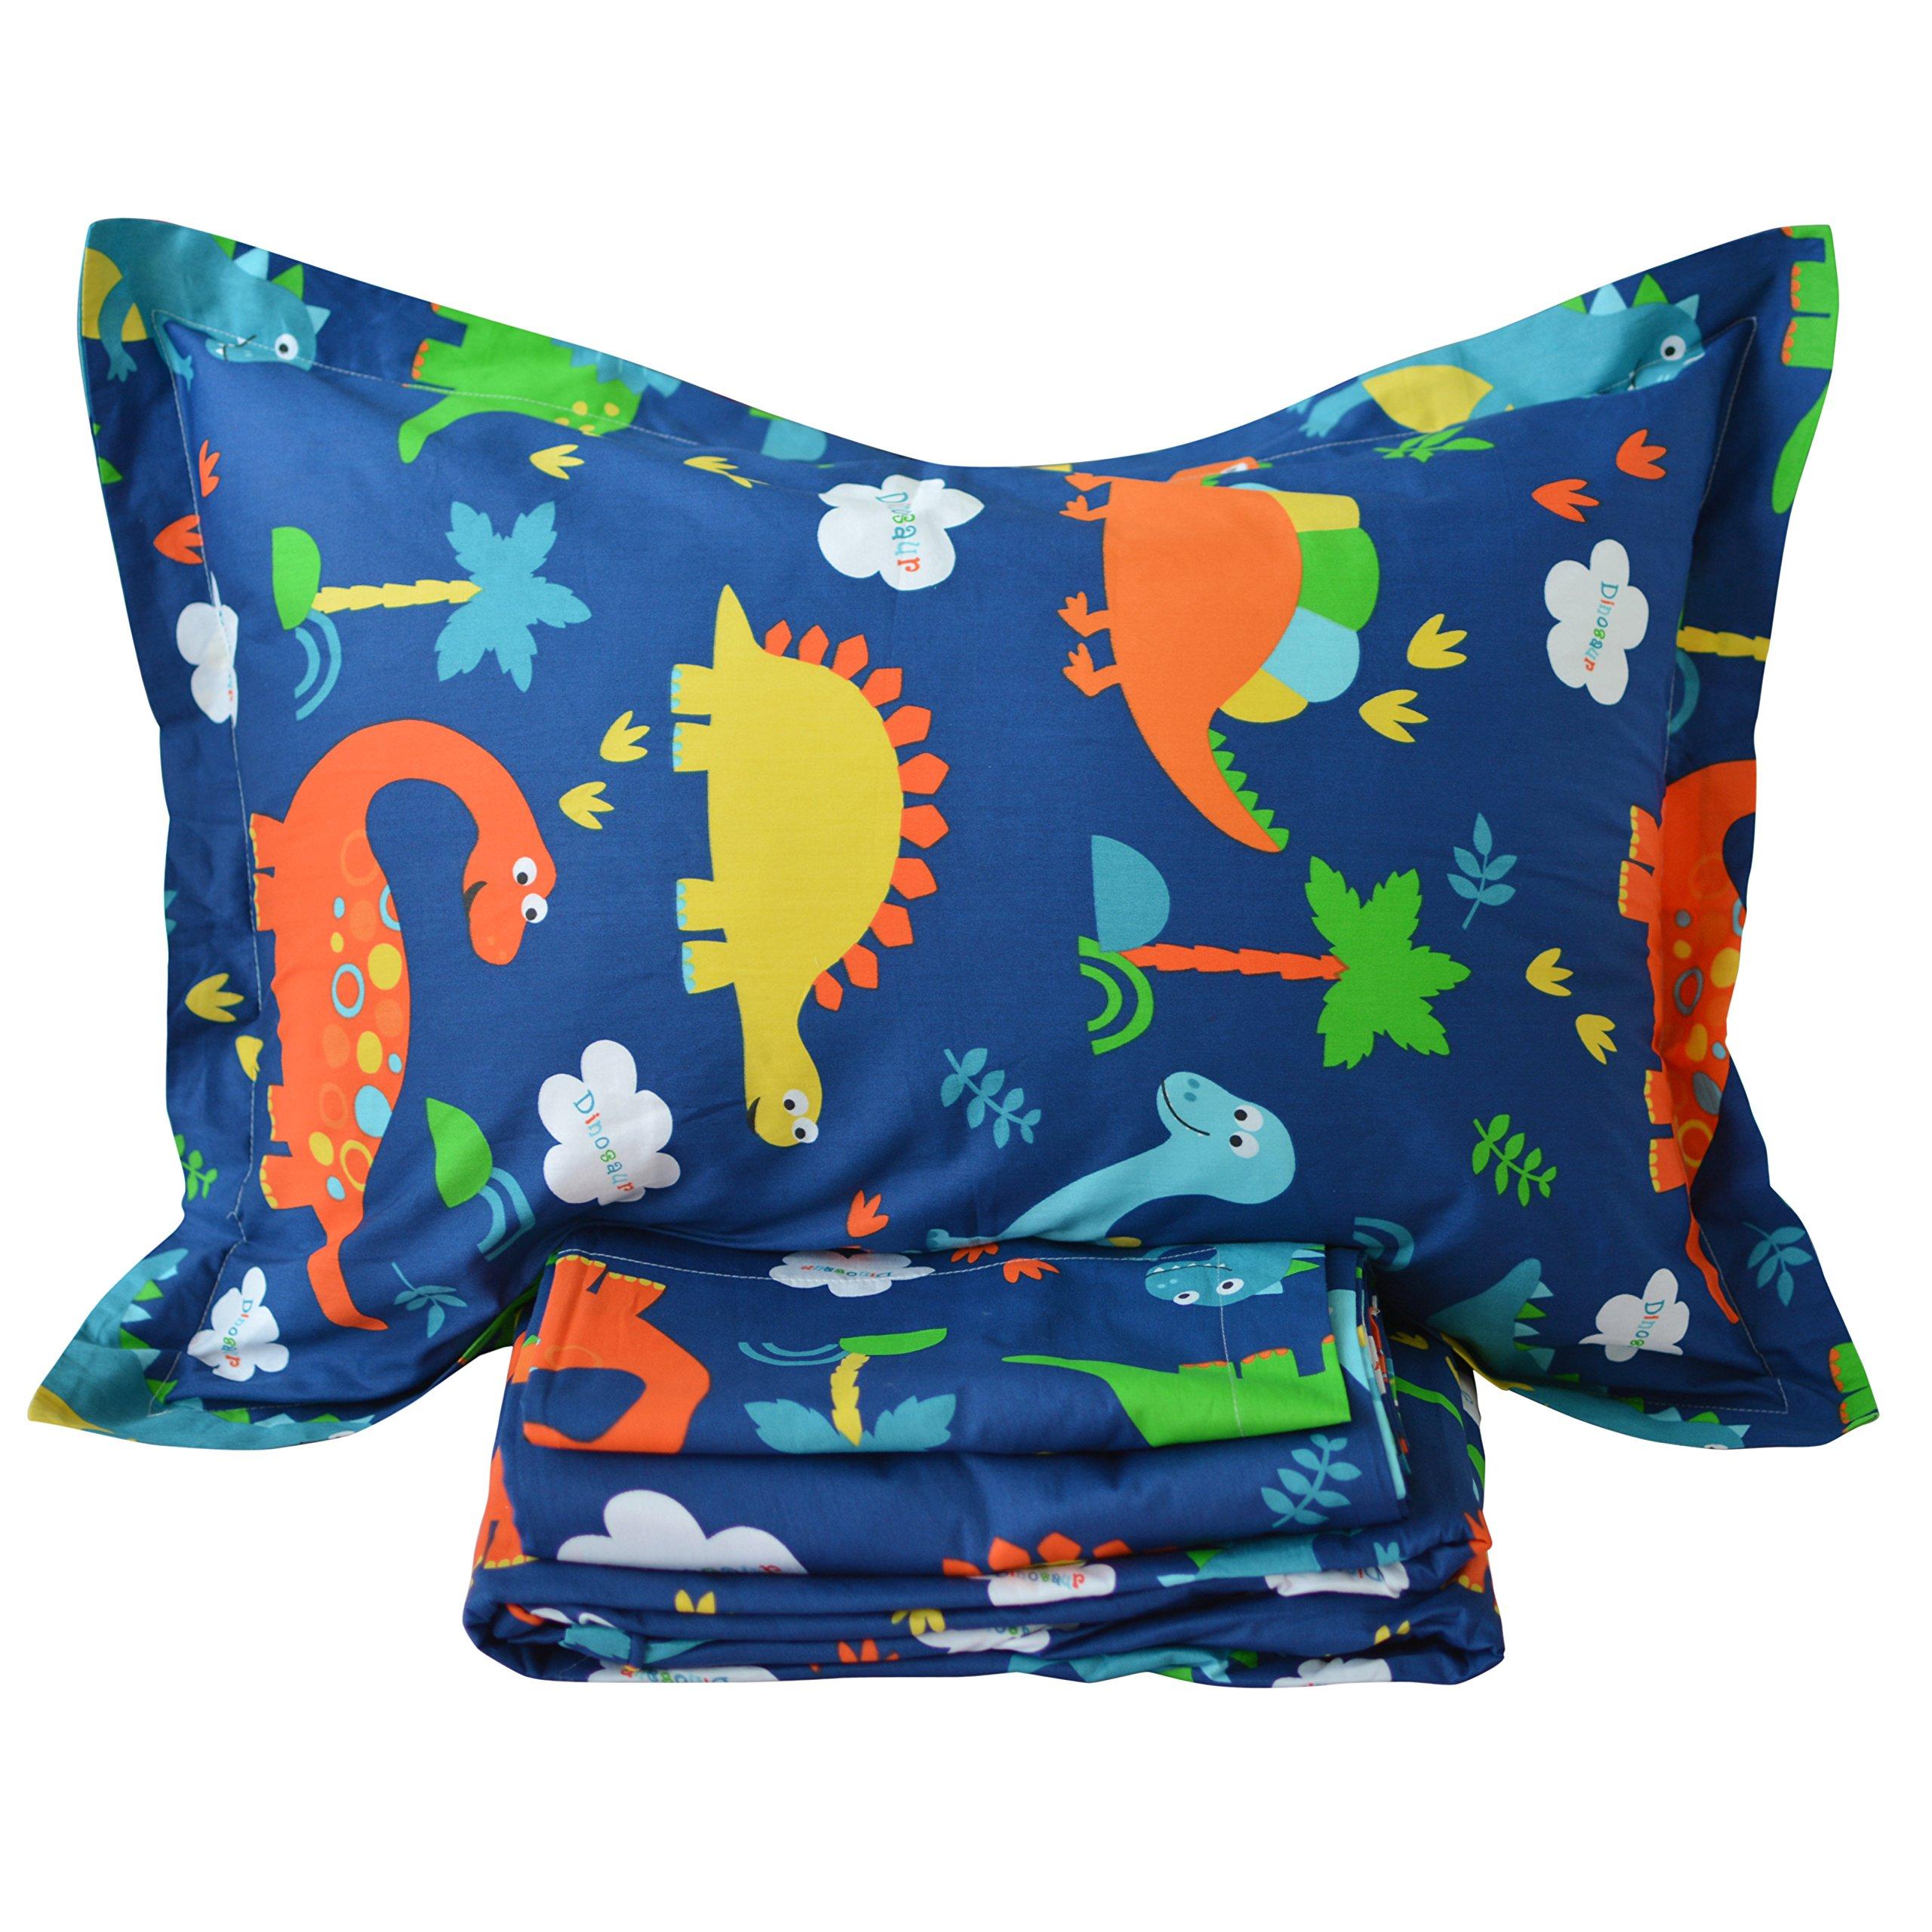 Brandream Soft Kids Boys Bedding Sets Blue Dinosaur Sheets Set 100% Cotton Bed Sheet Set-Fitted Sheet Flat Sheet Shams Set-King Size